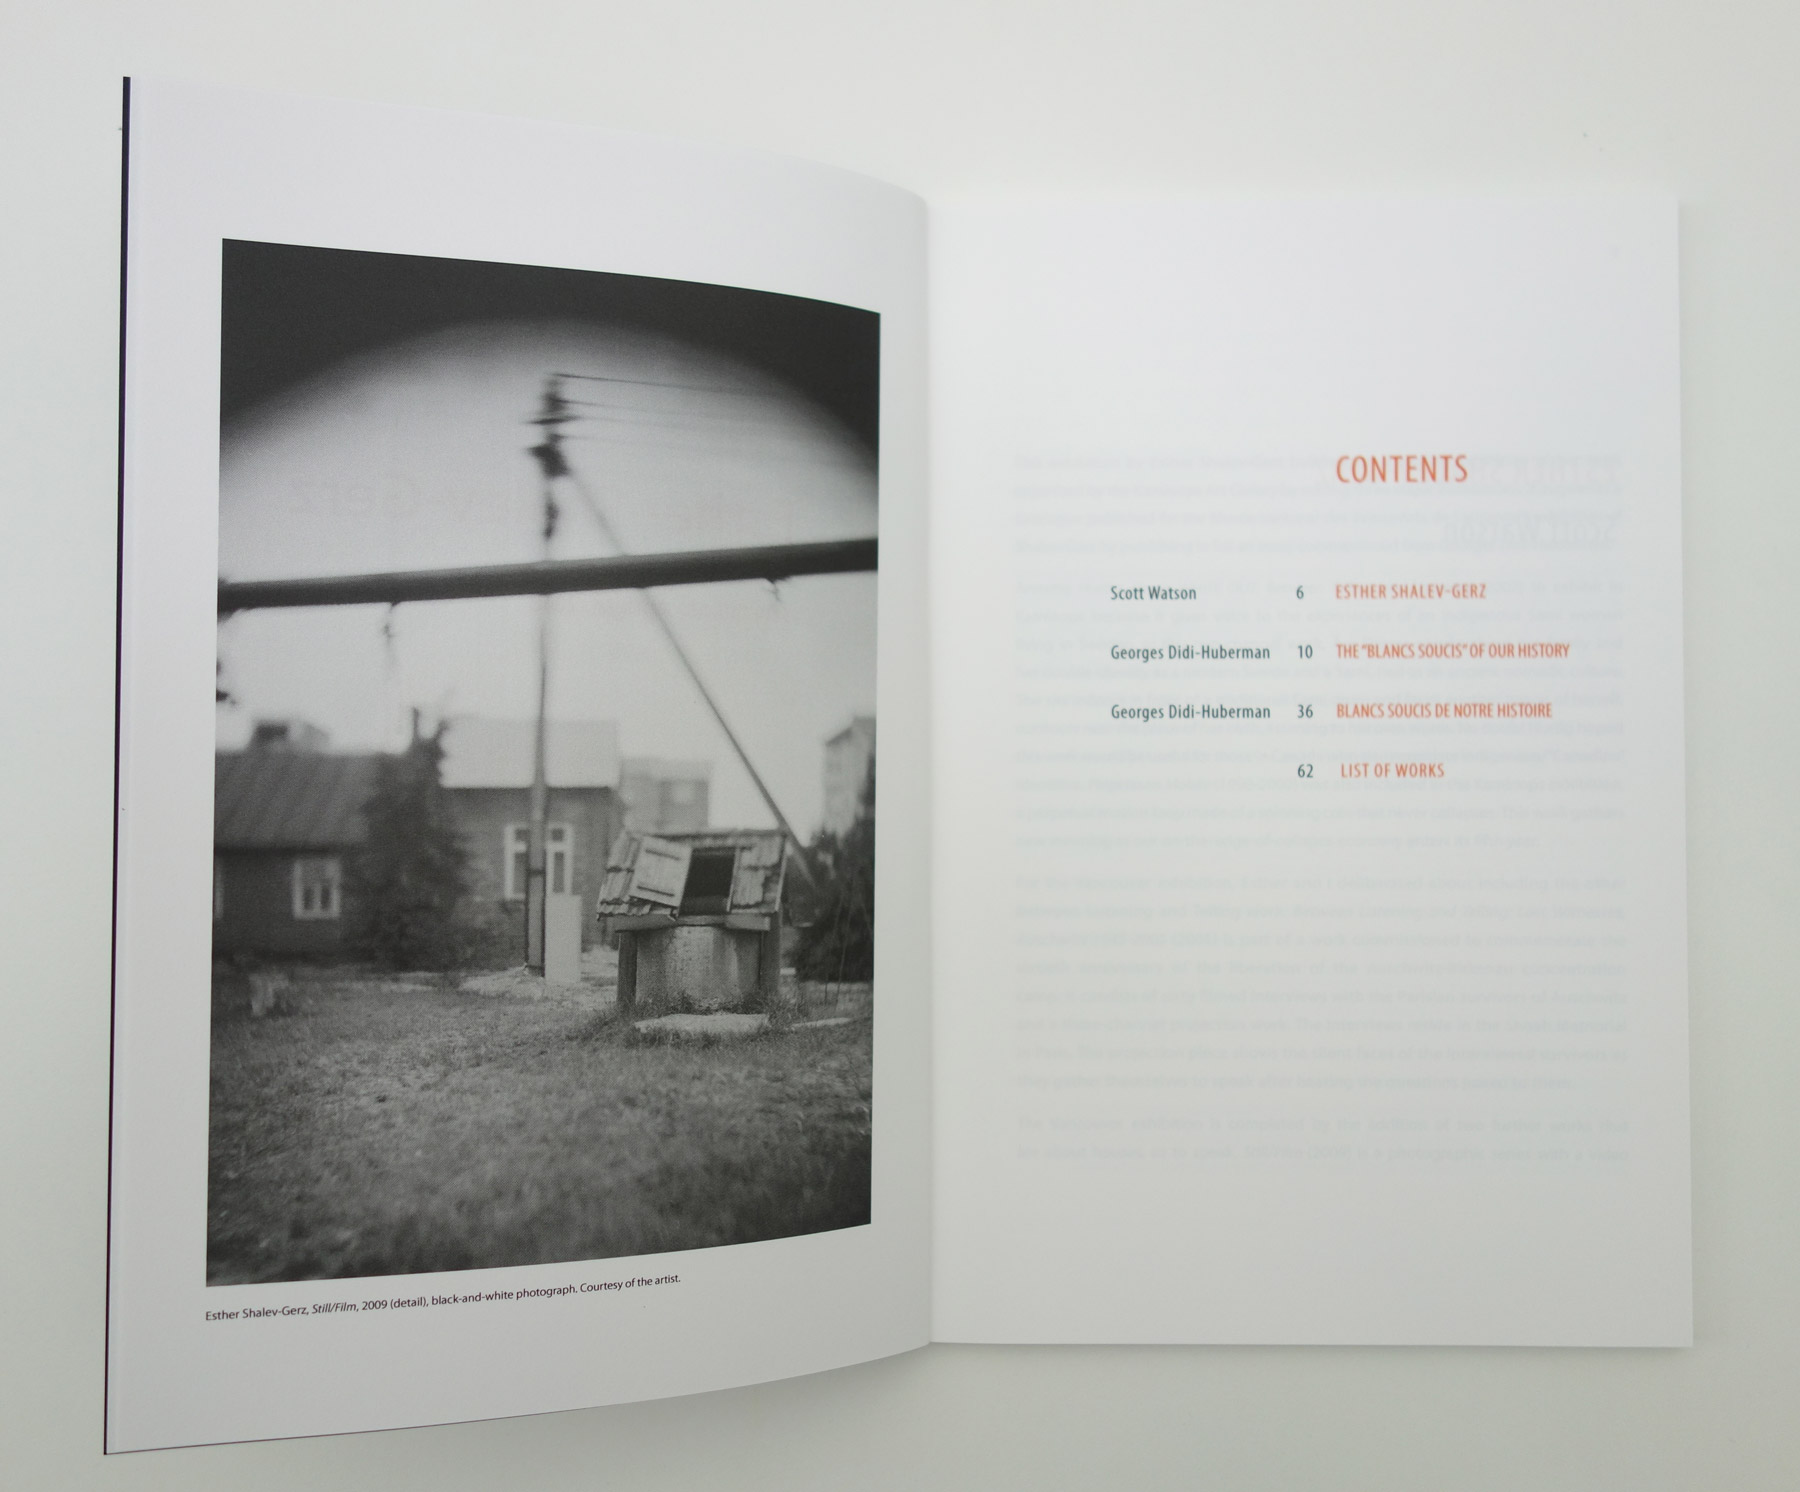 Esther Shalev-Gerz, Belkin Art Gallery